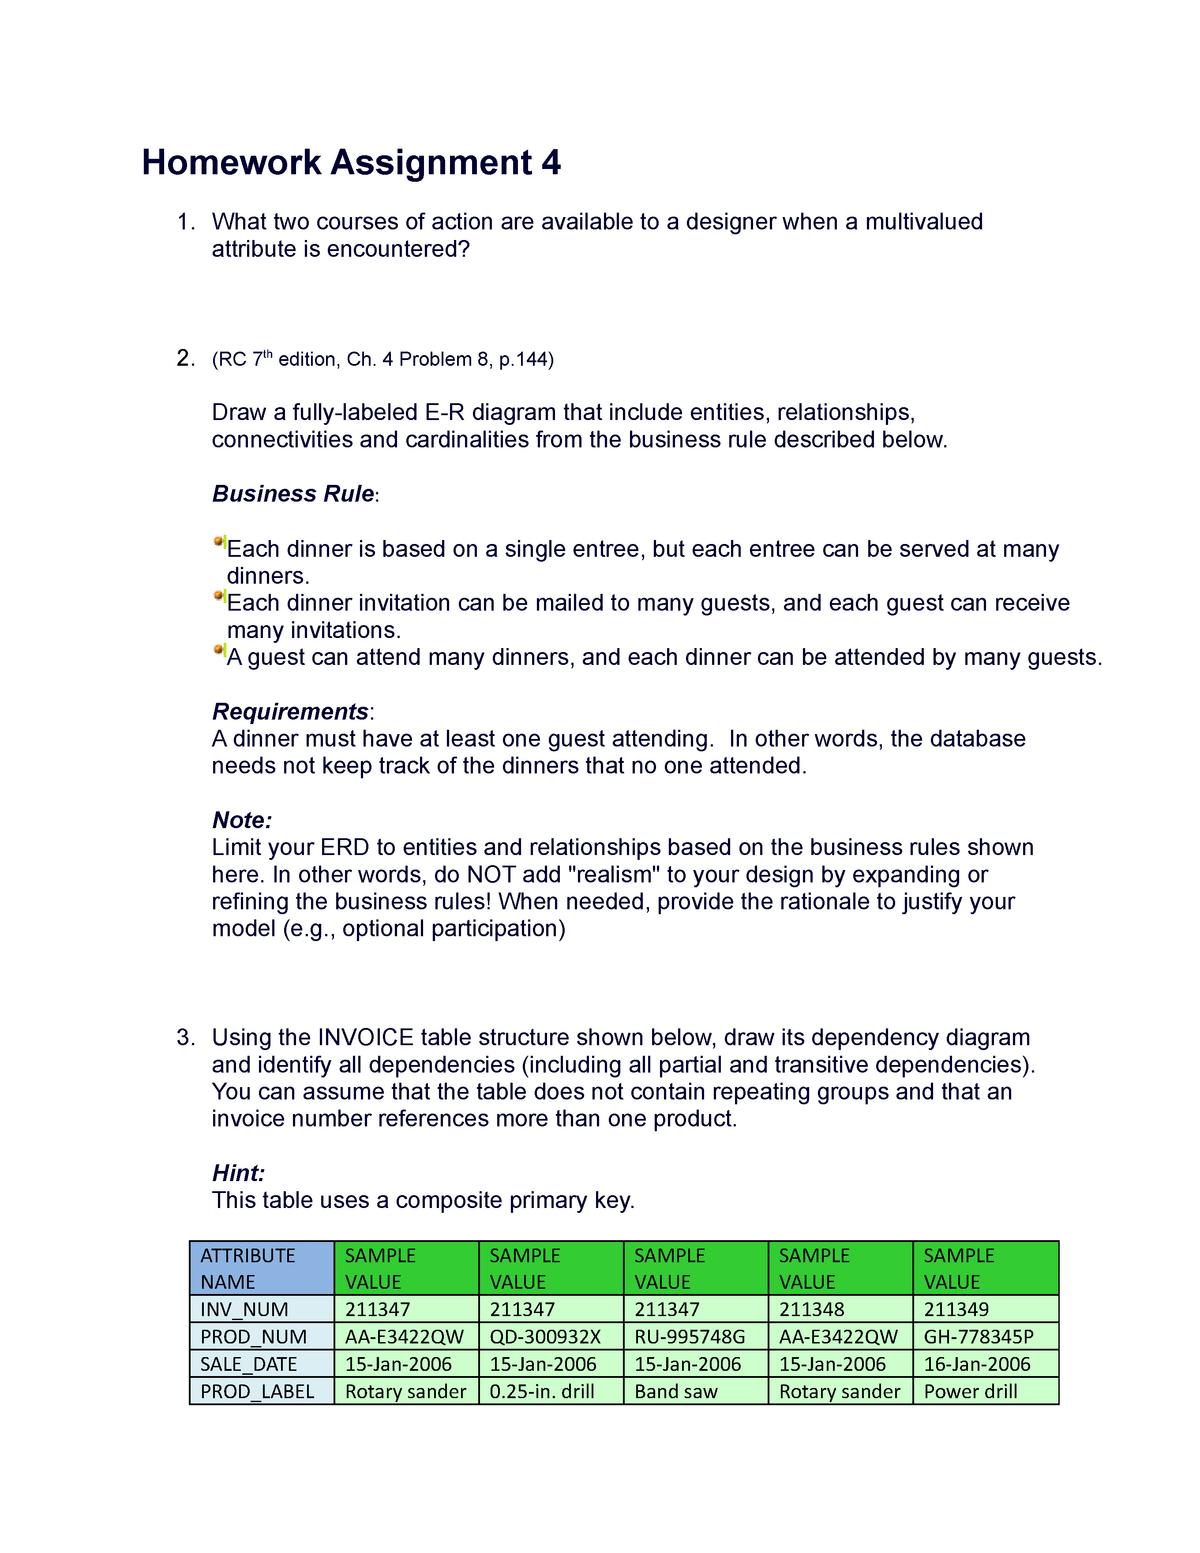 Seminar assignments - Homework 4 - ILS-Z 511 Database Design